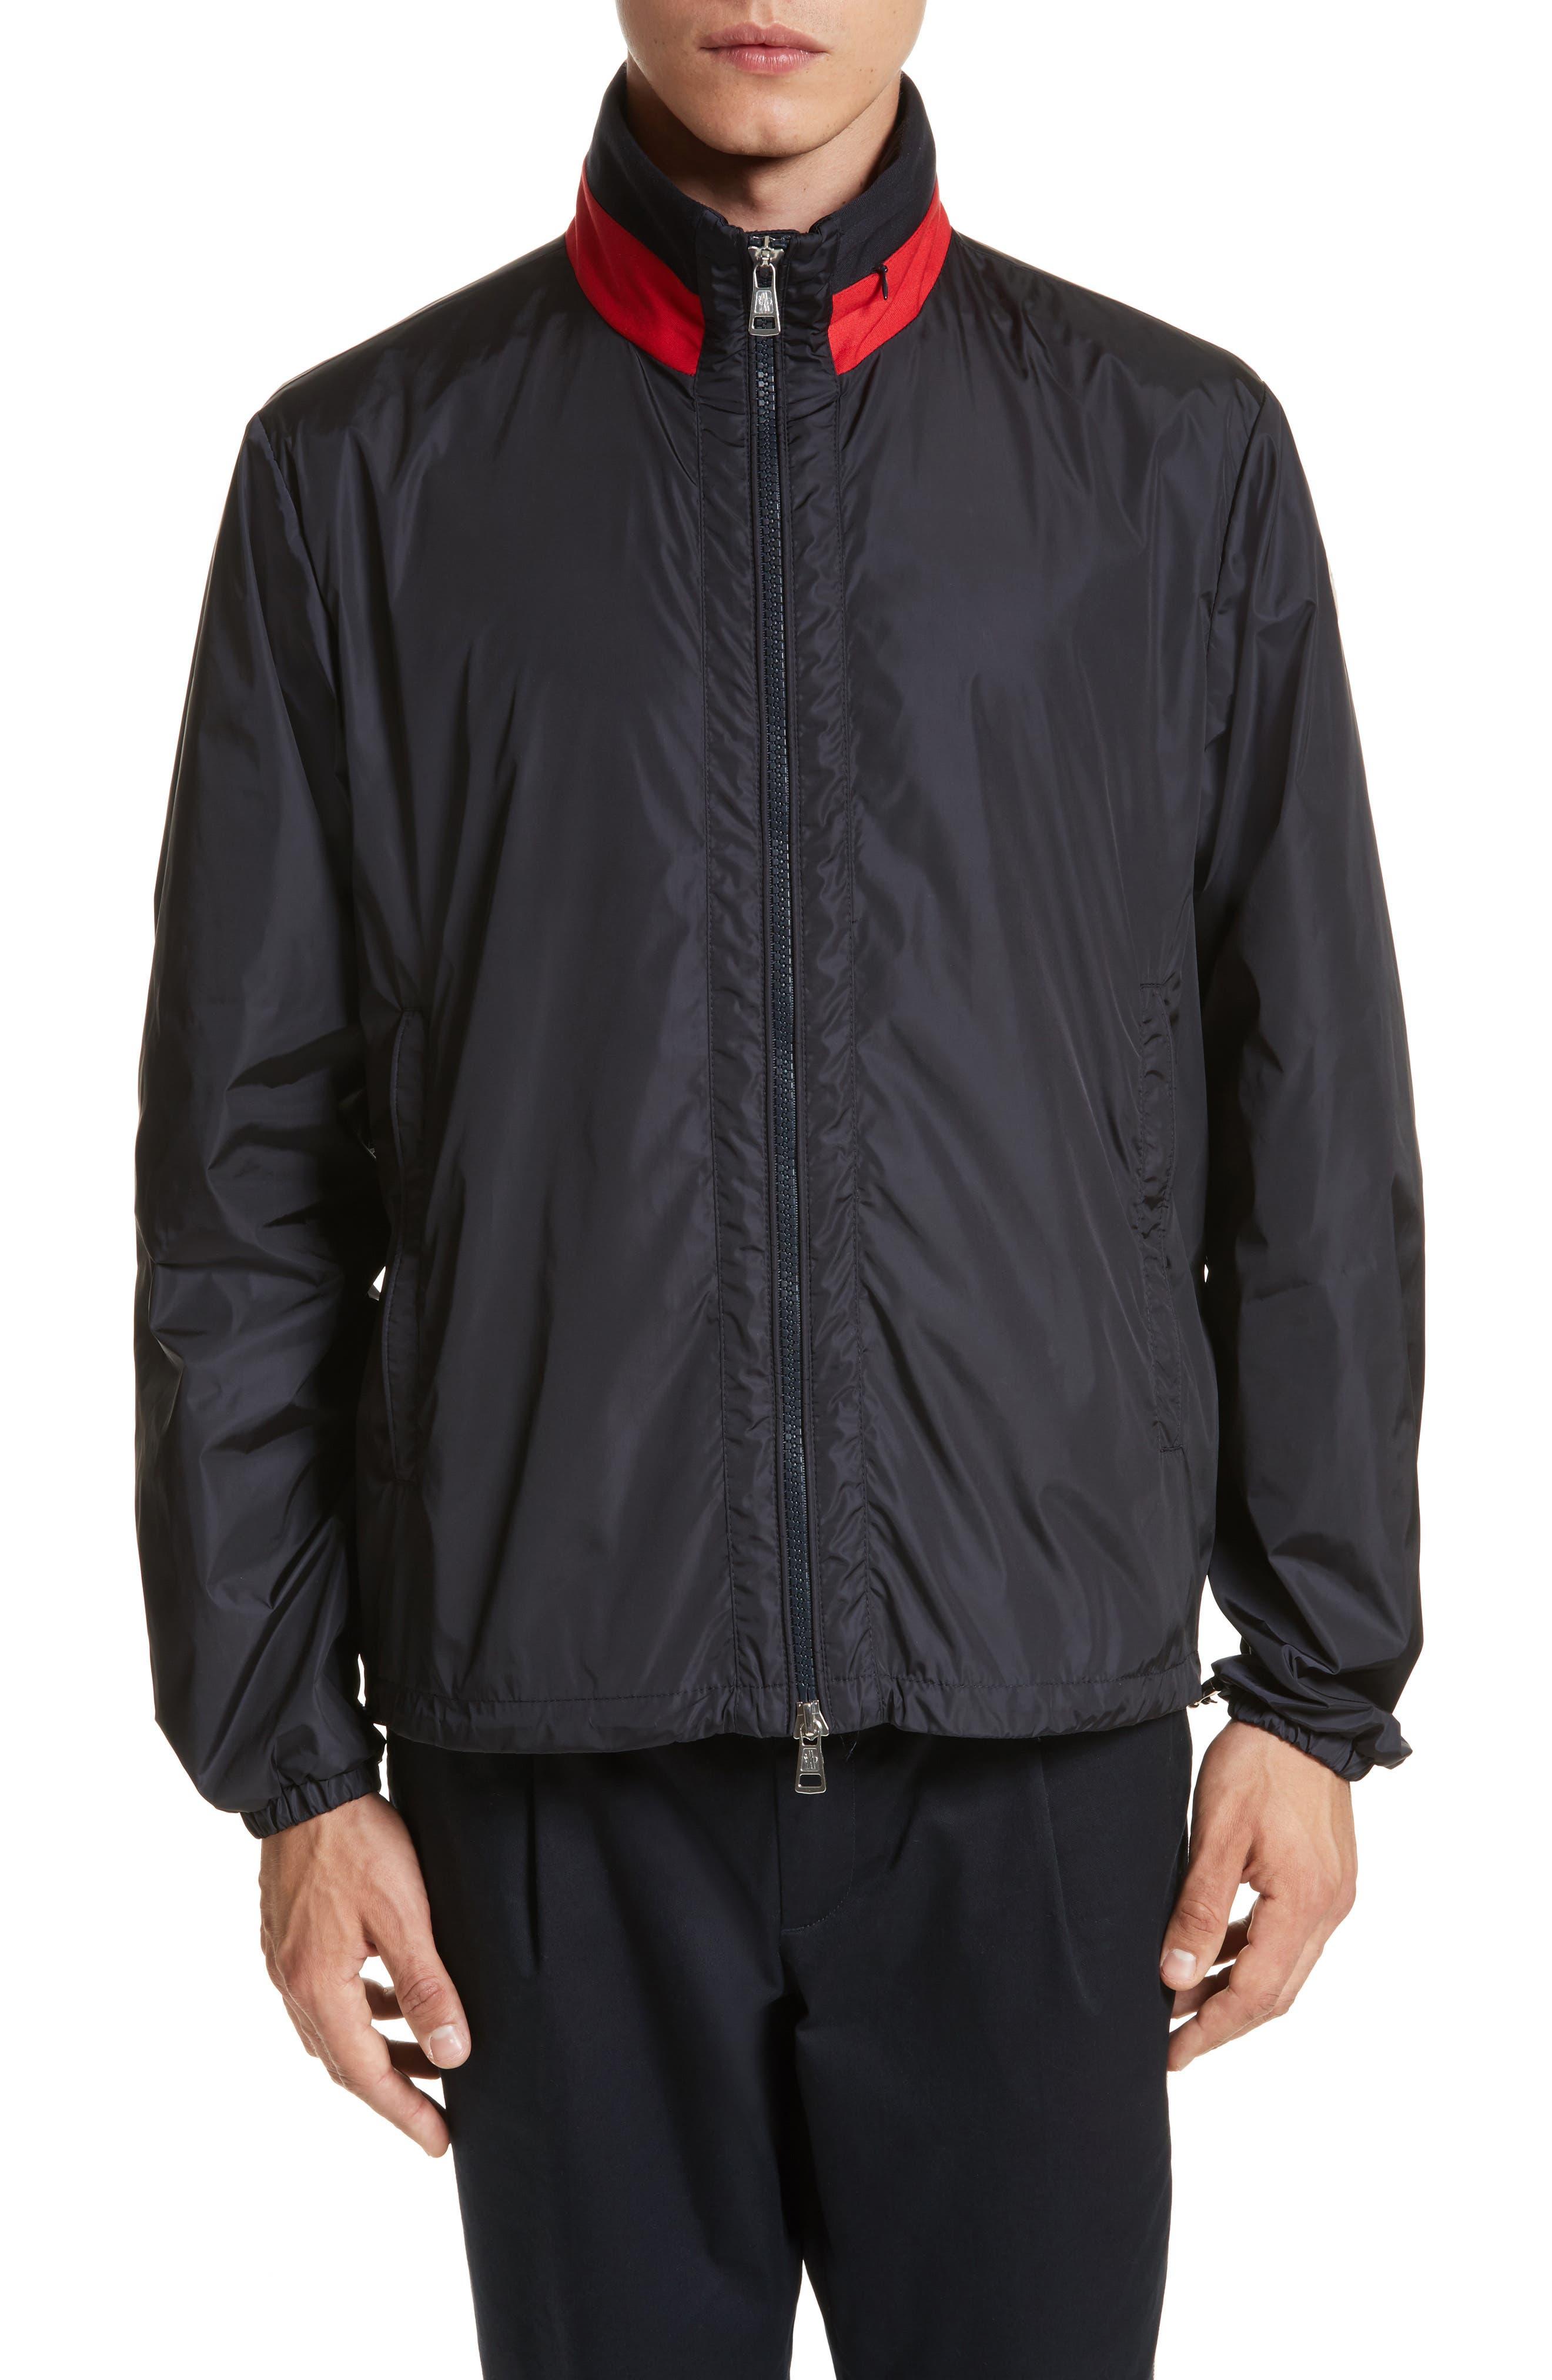 Goulier Nylon Jacket,                             Alternate thumbnail 4, color,                             NAVY